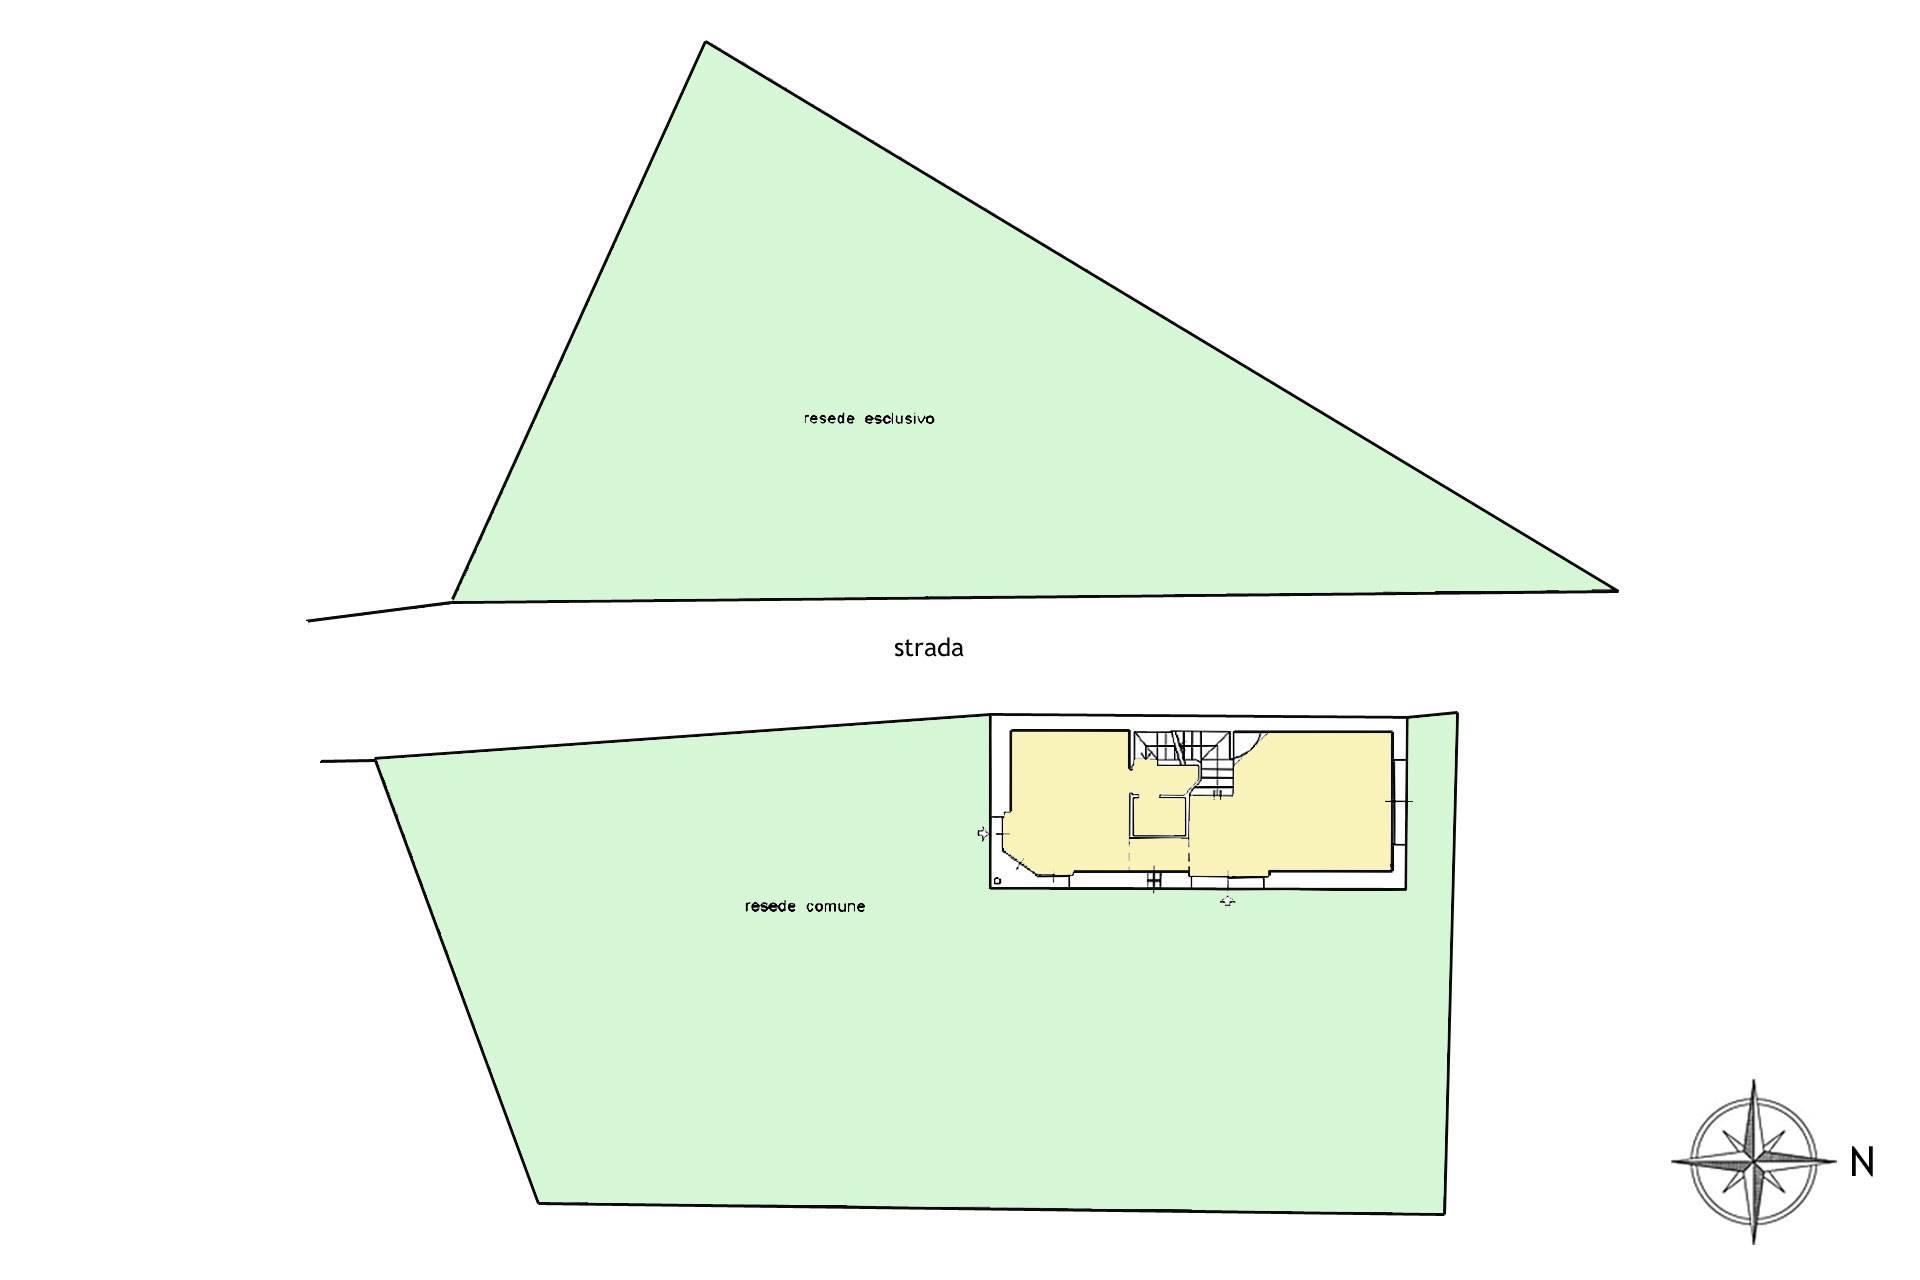 plan ubicativa